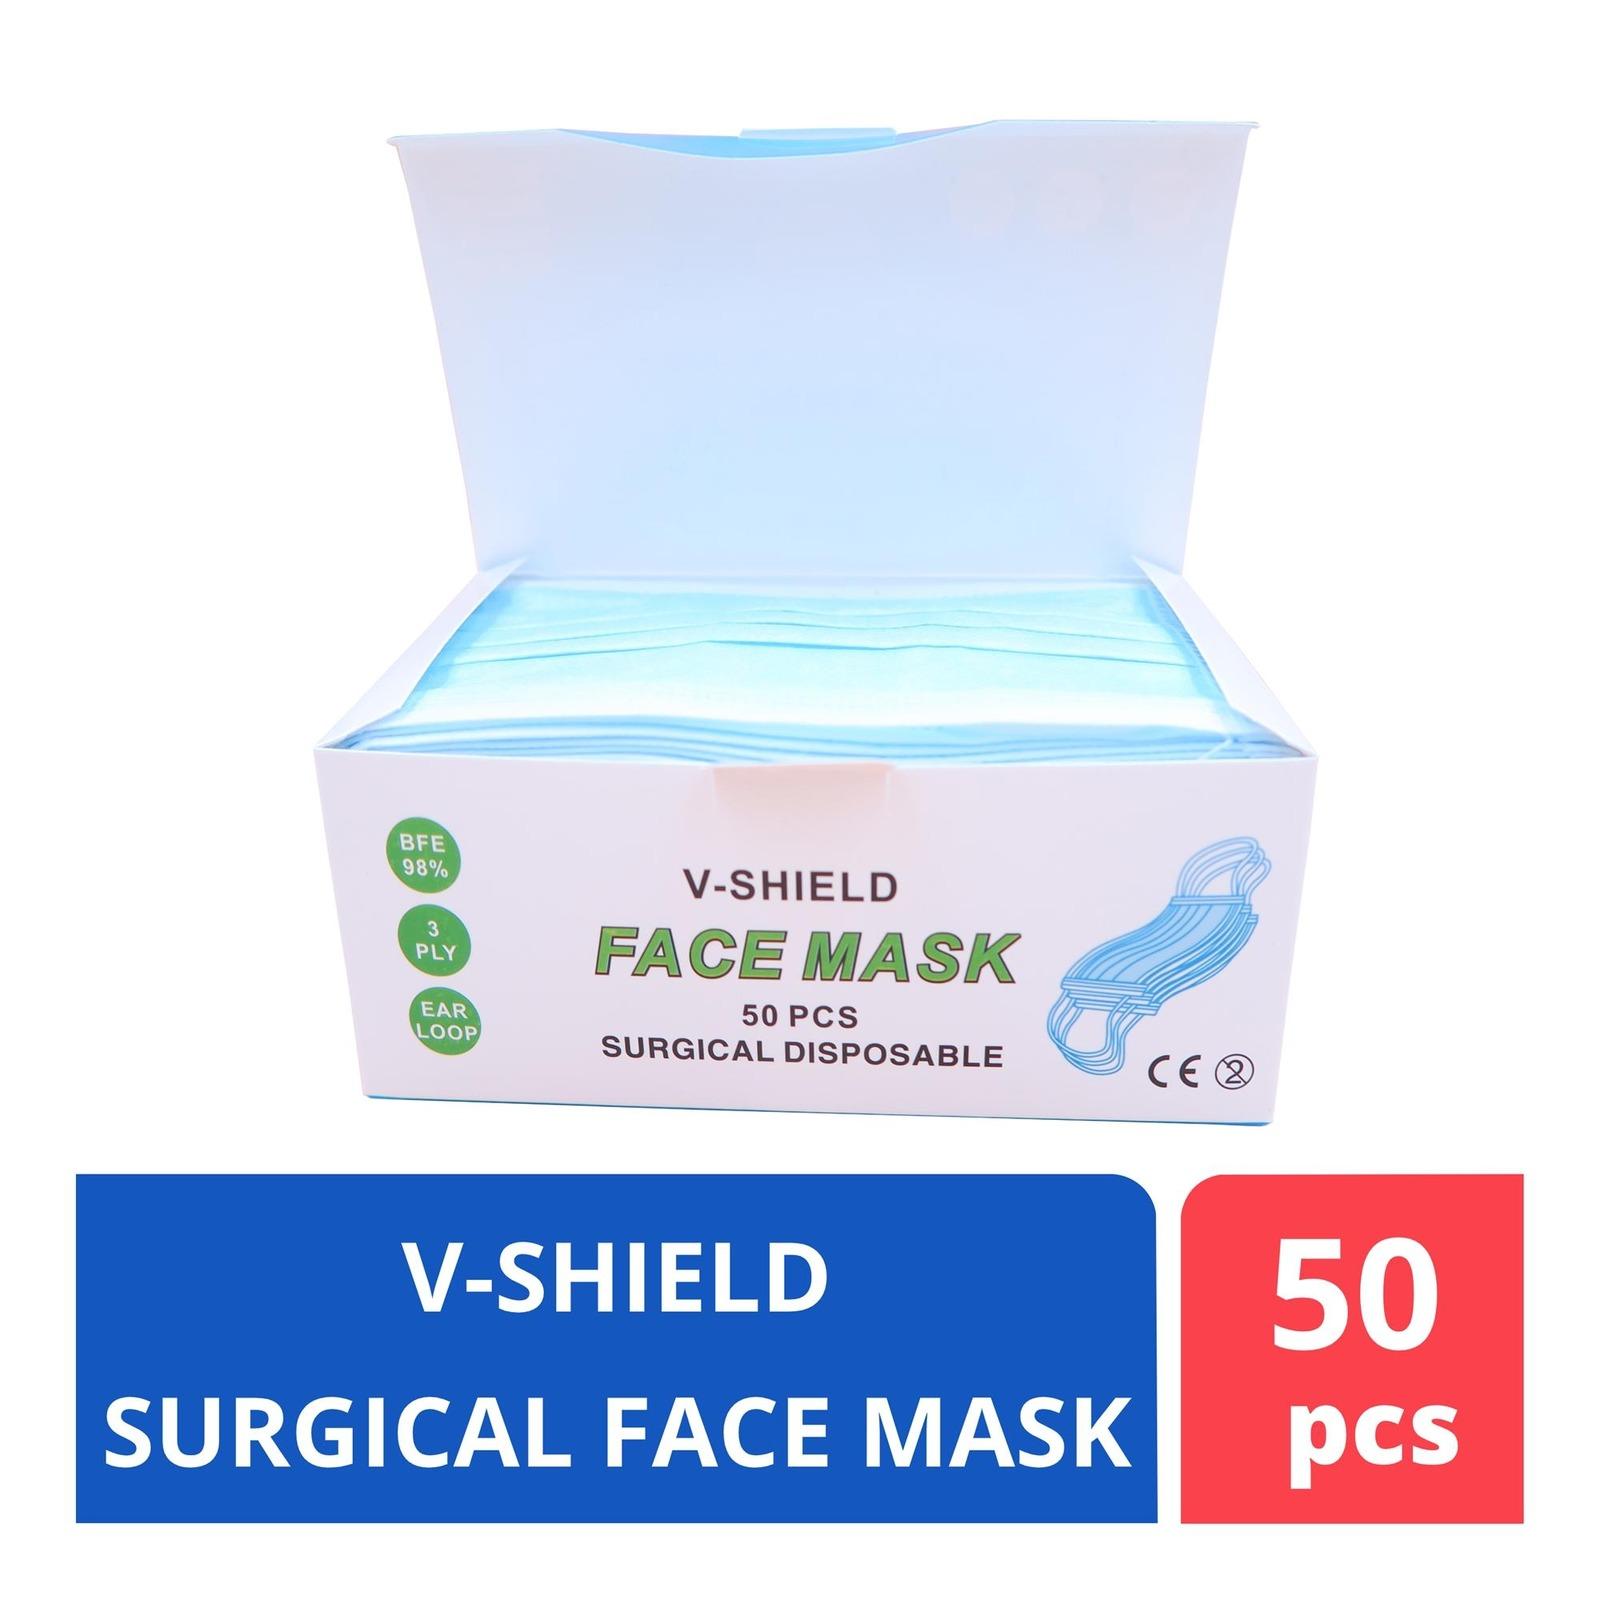 ALCARE V-shield Surgical Face Mask